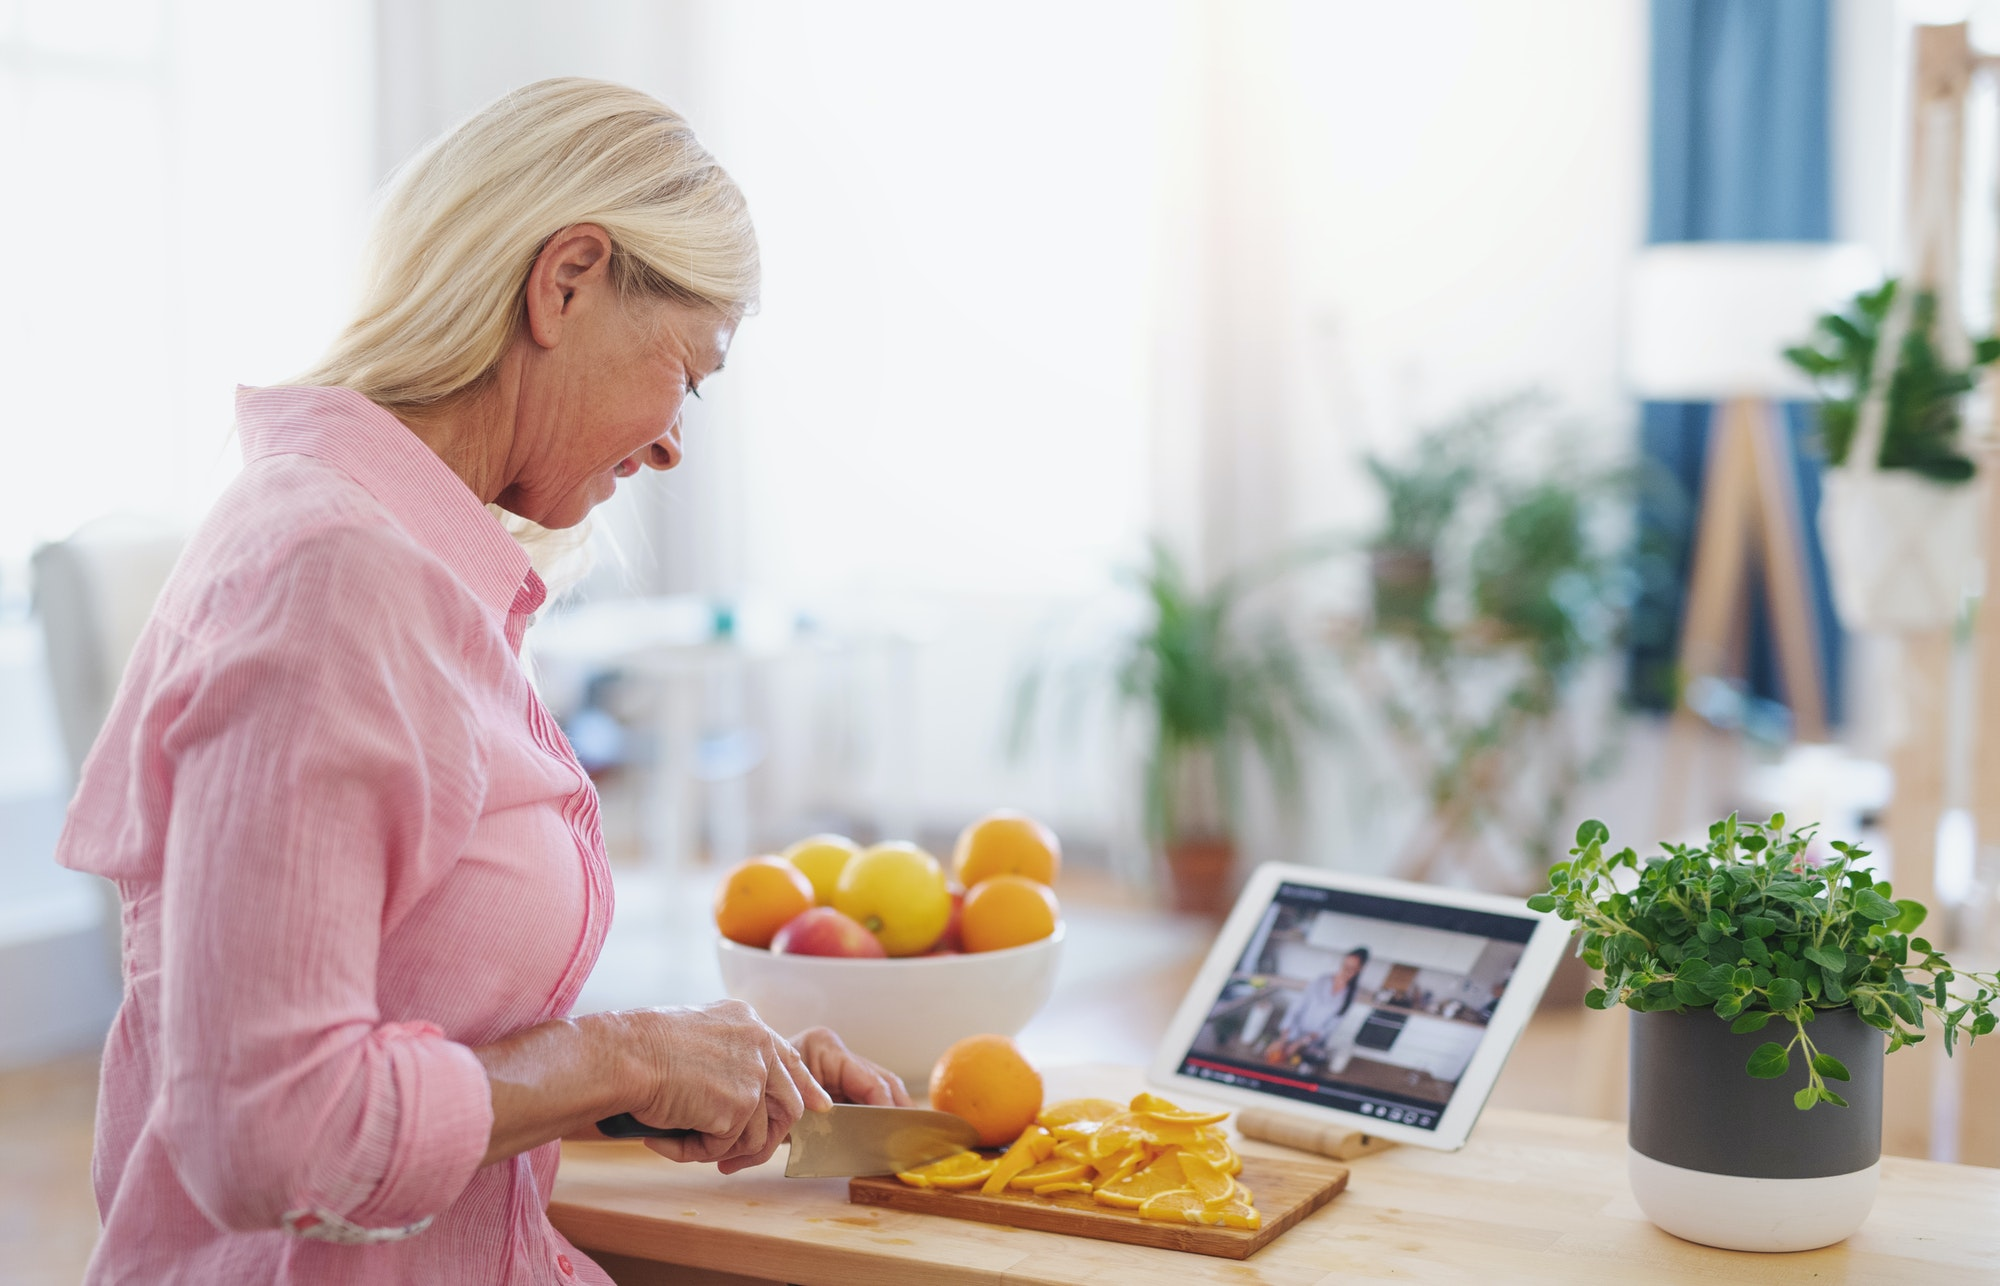 Senior woman preparing food in kitchen indoors, following food vlogger